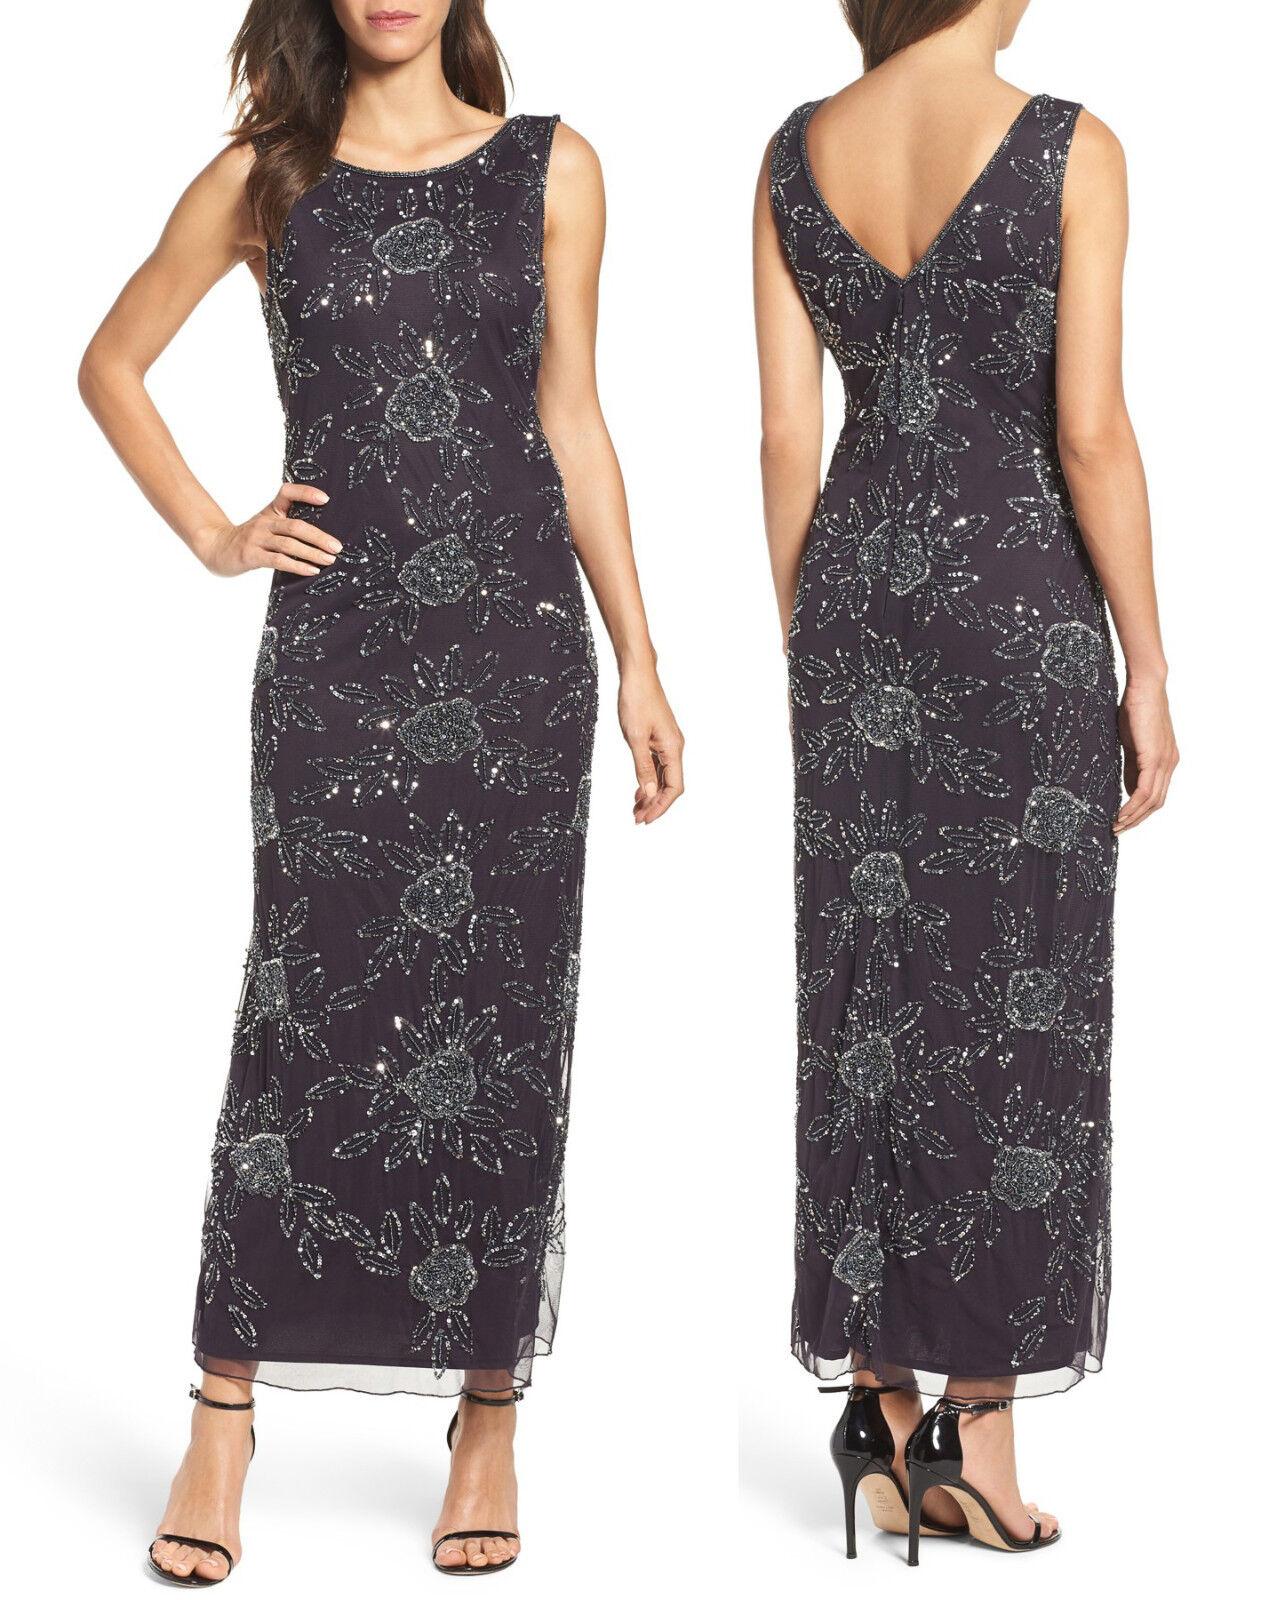 NWT Pisarro Nights Beaded Mesh Gown Dress EGGPLANT Size 10P